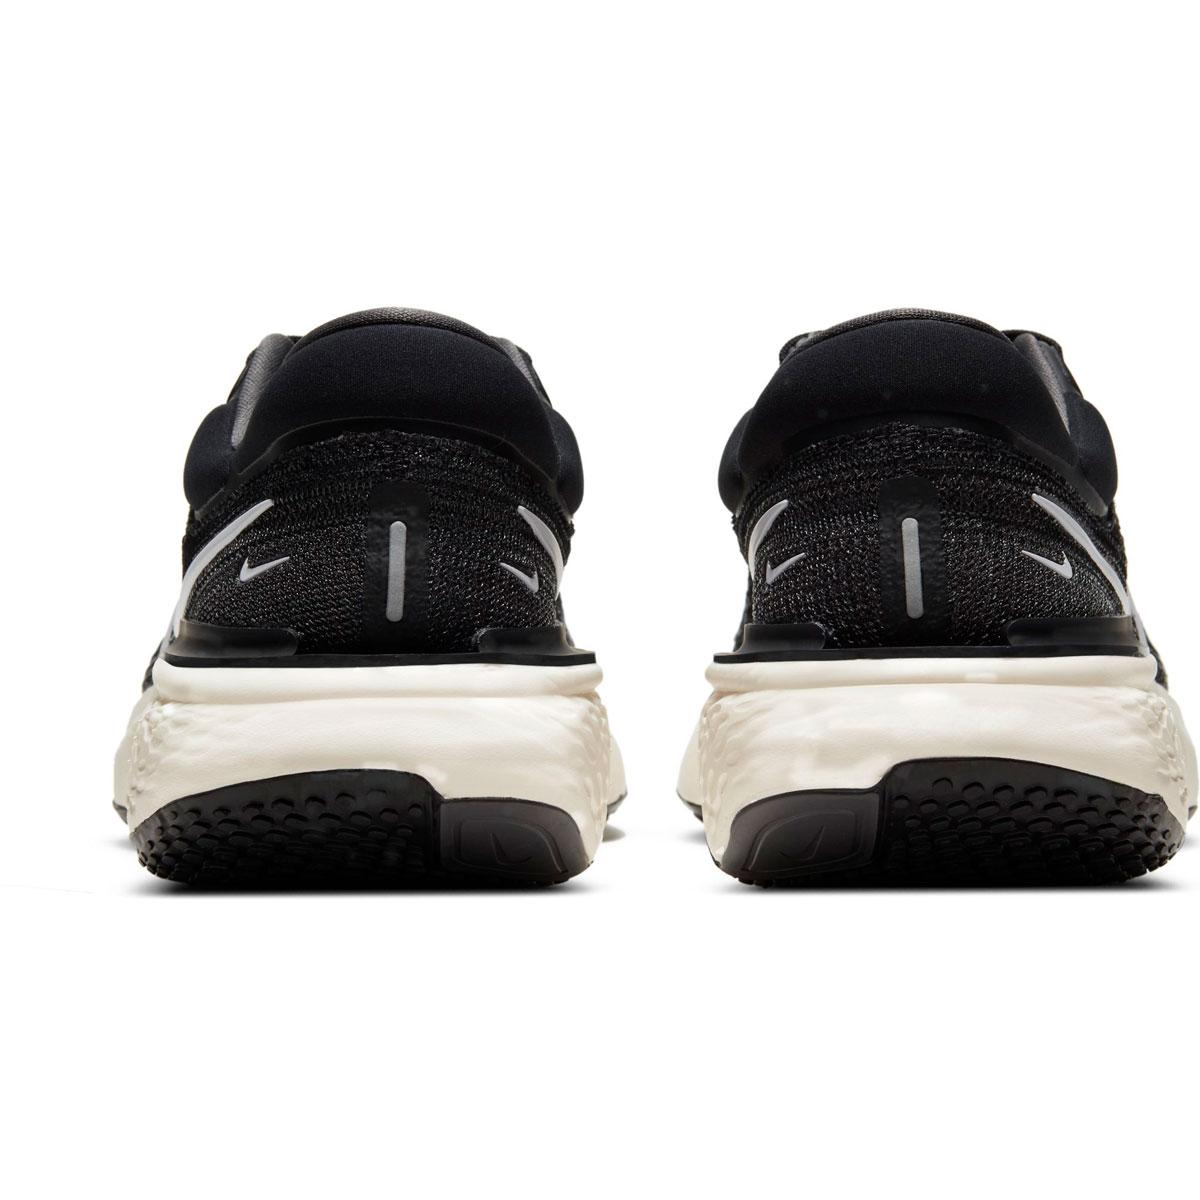 Women's Nike Zoomx Invincible Run FlyKnit Running Shoe - Color: Black/White/Iron Grey - Size: 5 - Width: Regular, Black/White/Iron Grey, large, image 4